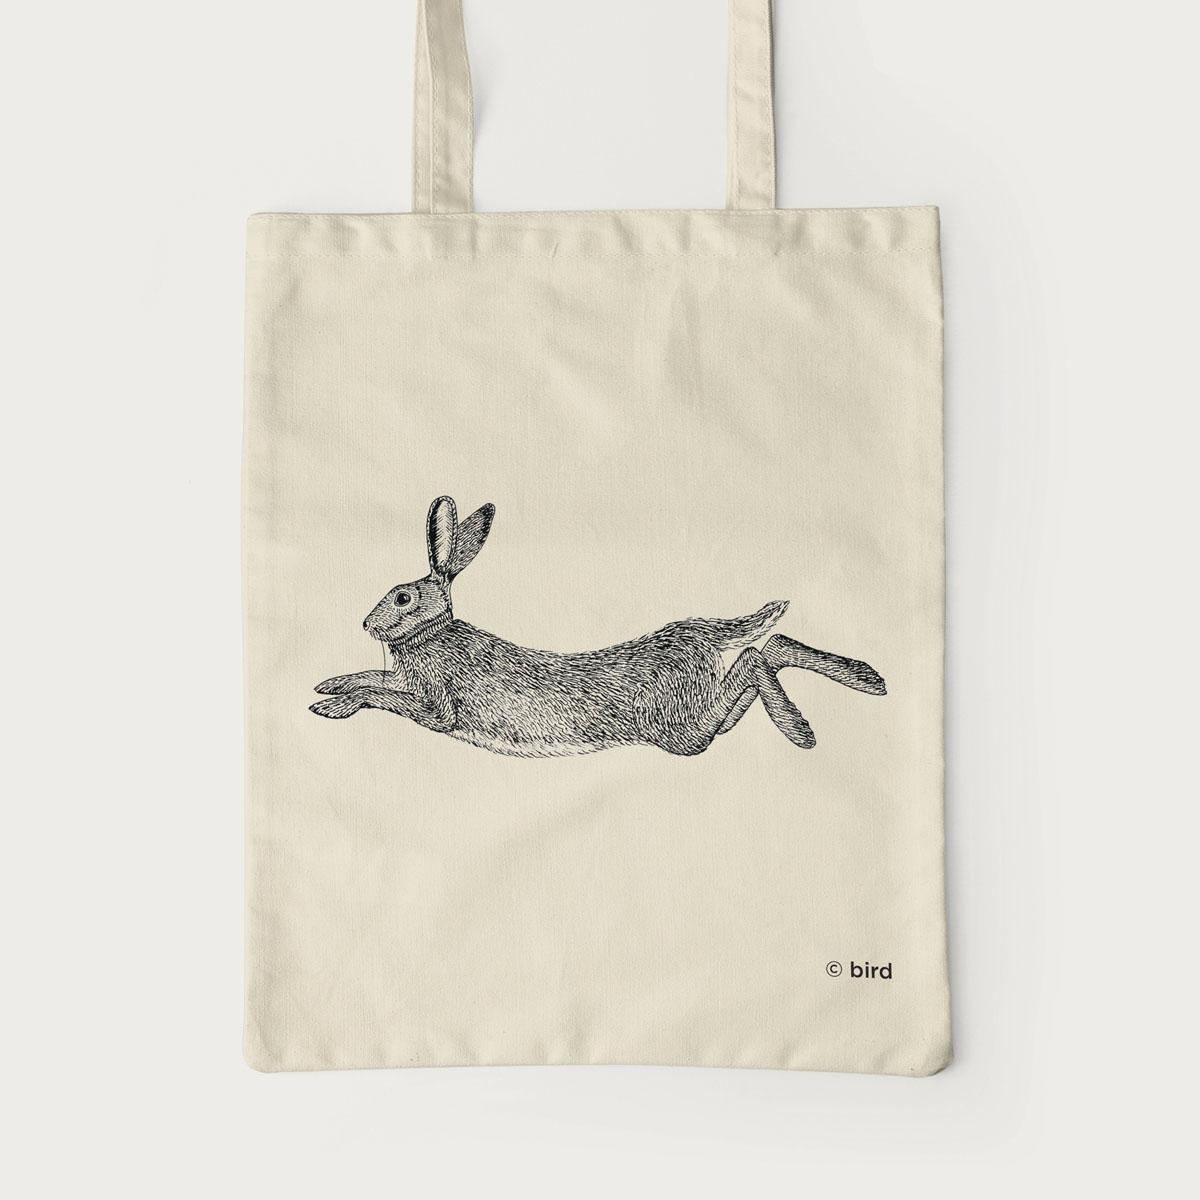 Hare Screen Printed Cotton Tote Bag